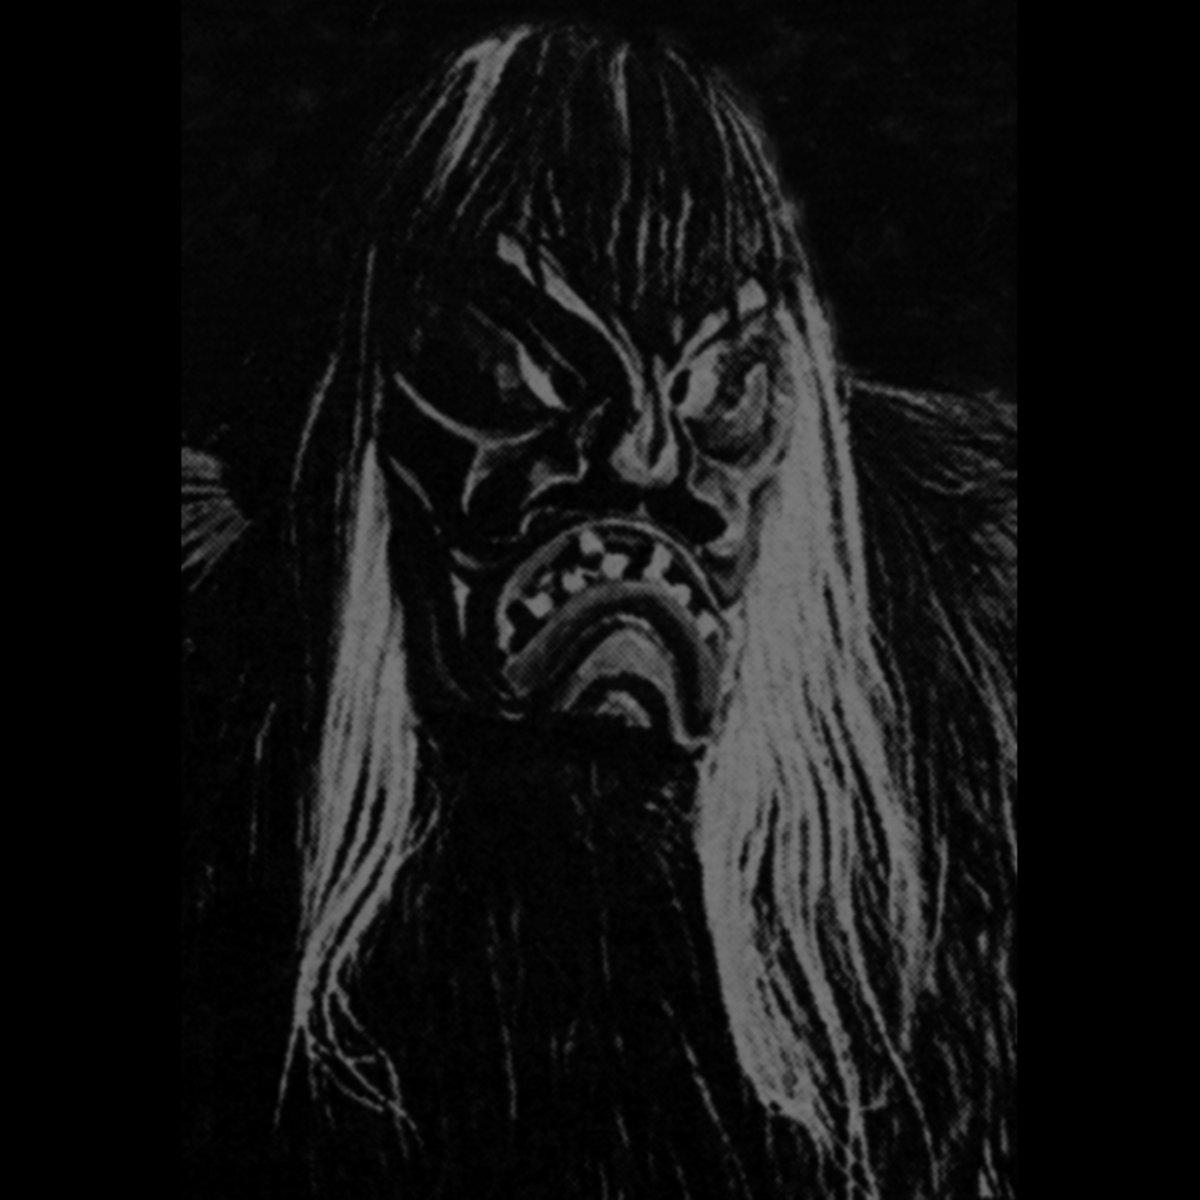 Geister Paysage d'Hiver Album Cover Artwork